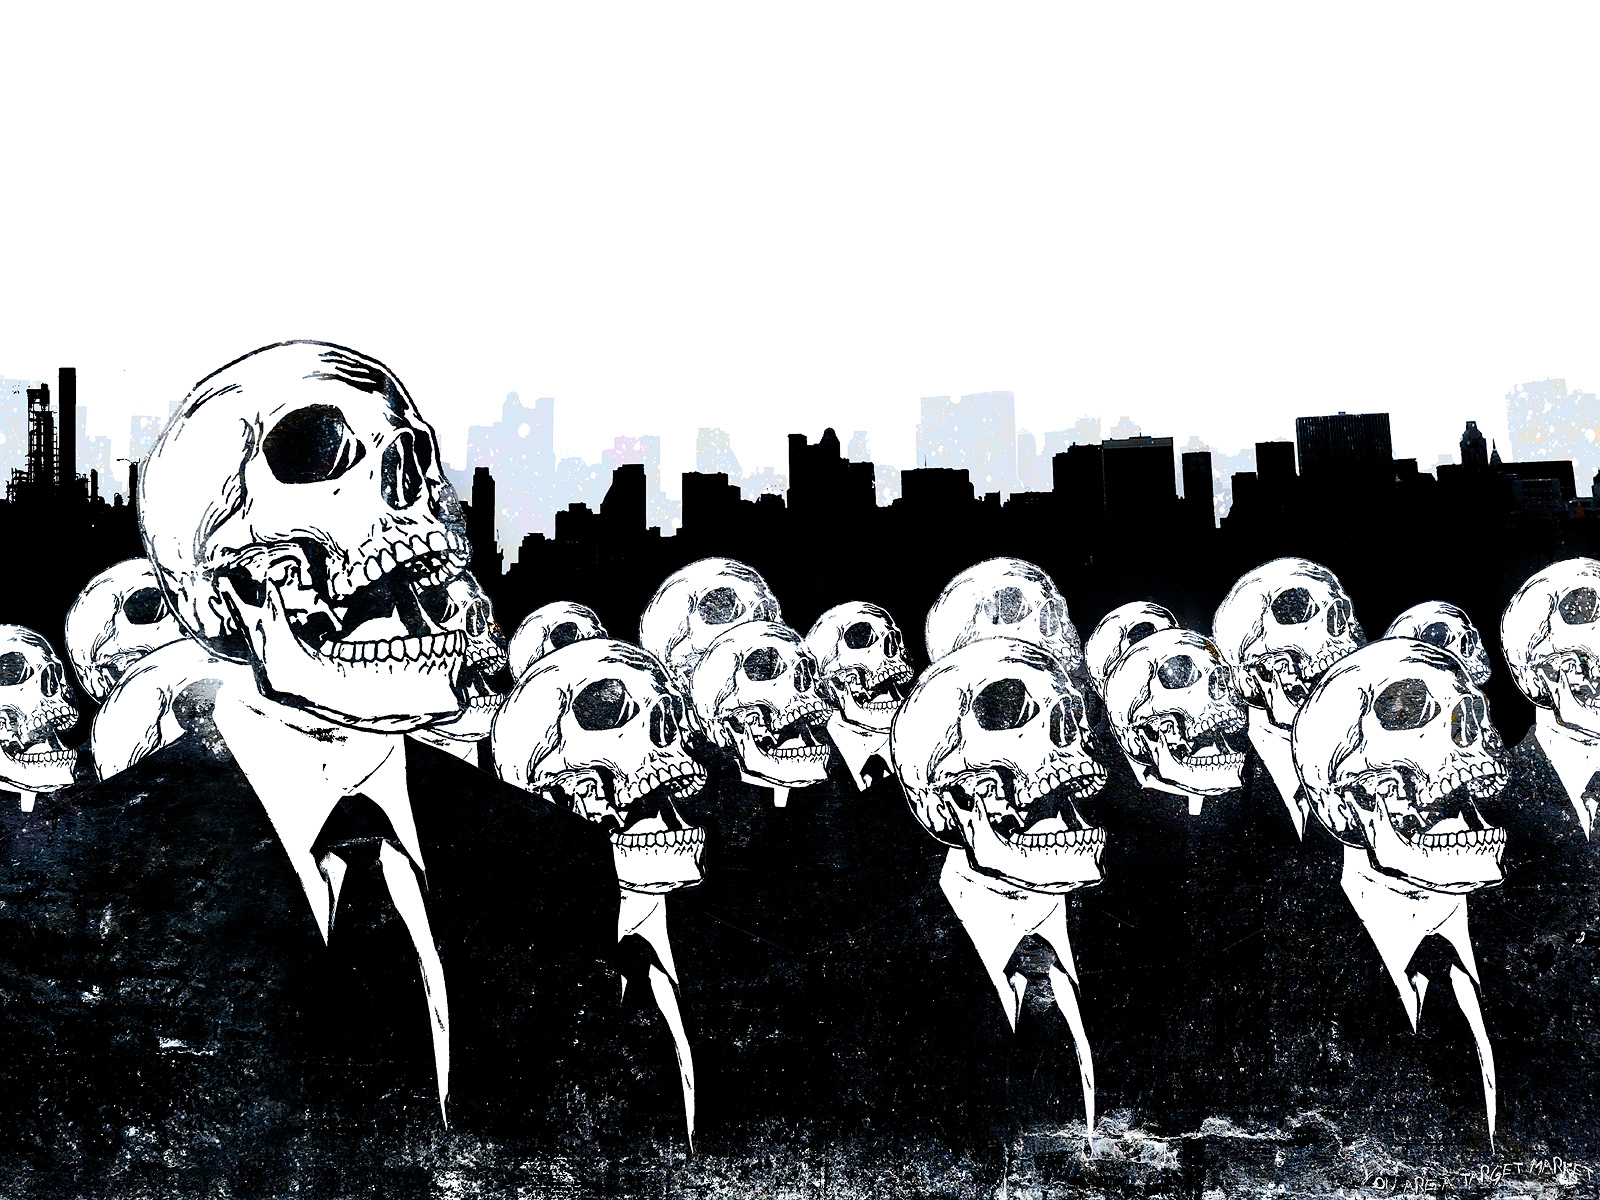 crowded-skulls-wallpaper-by-unfitguitarist